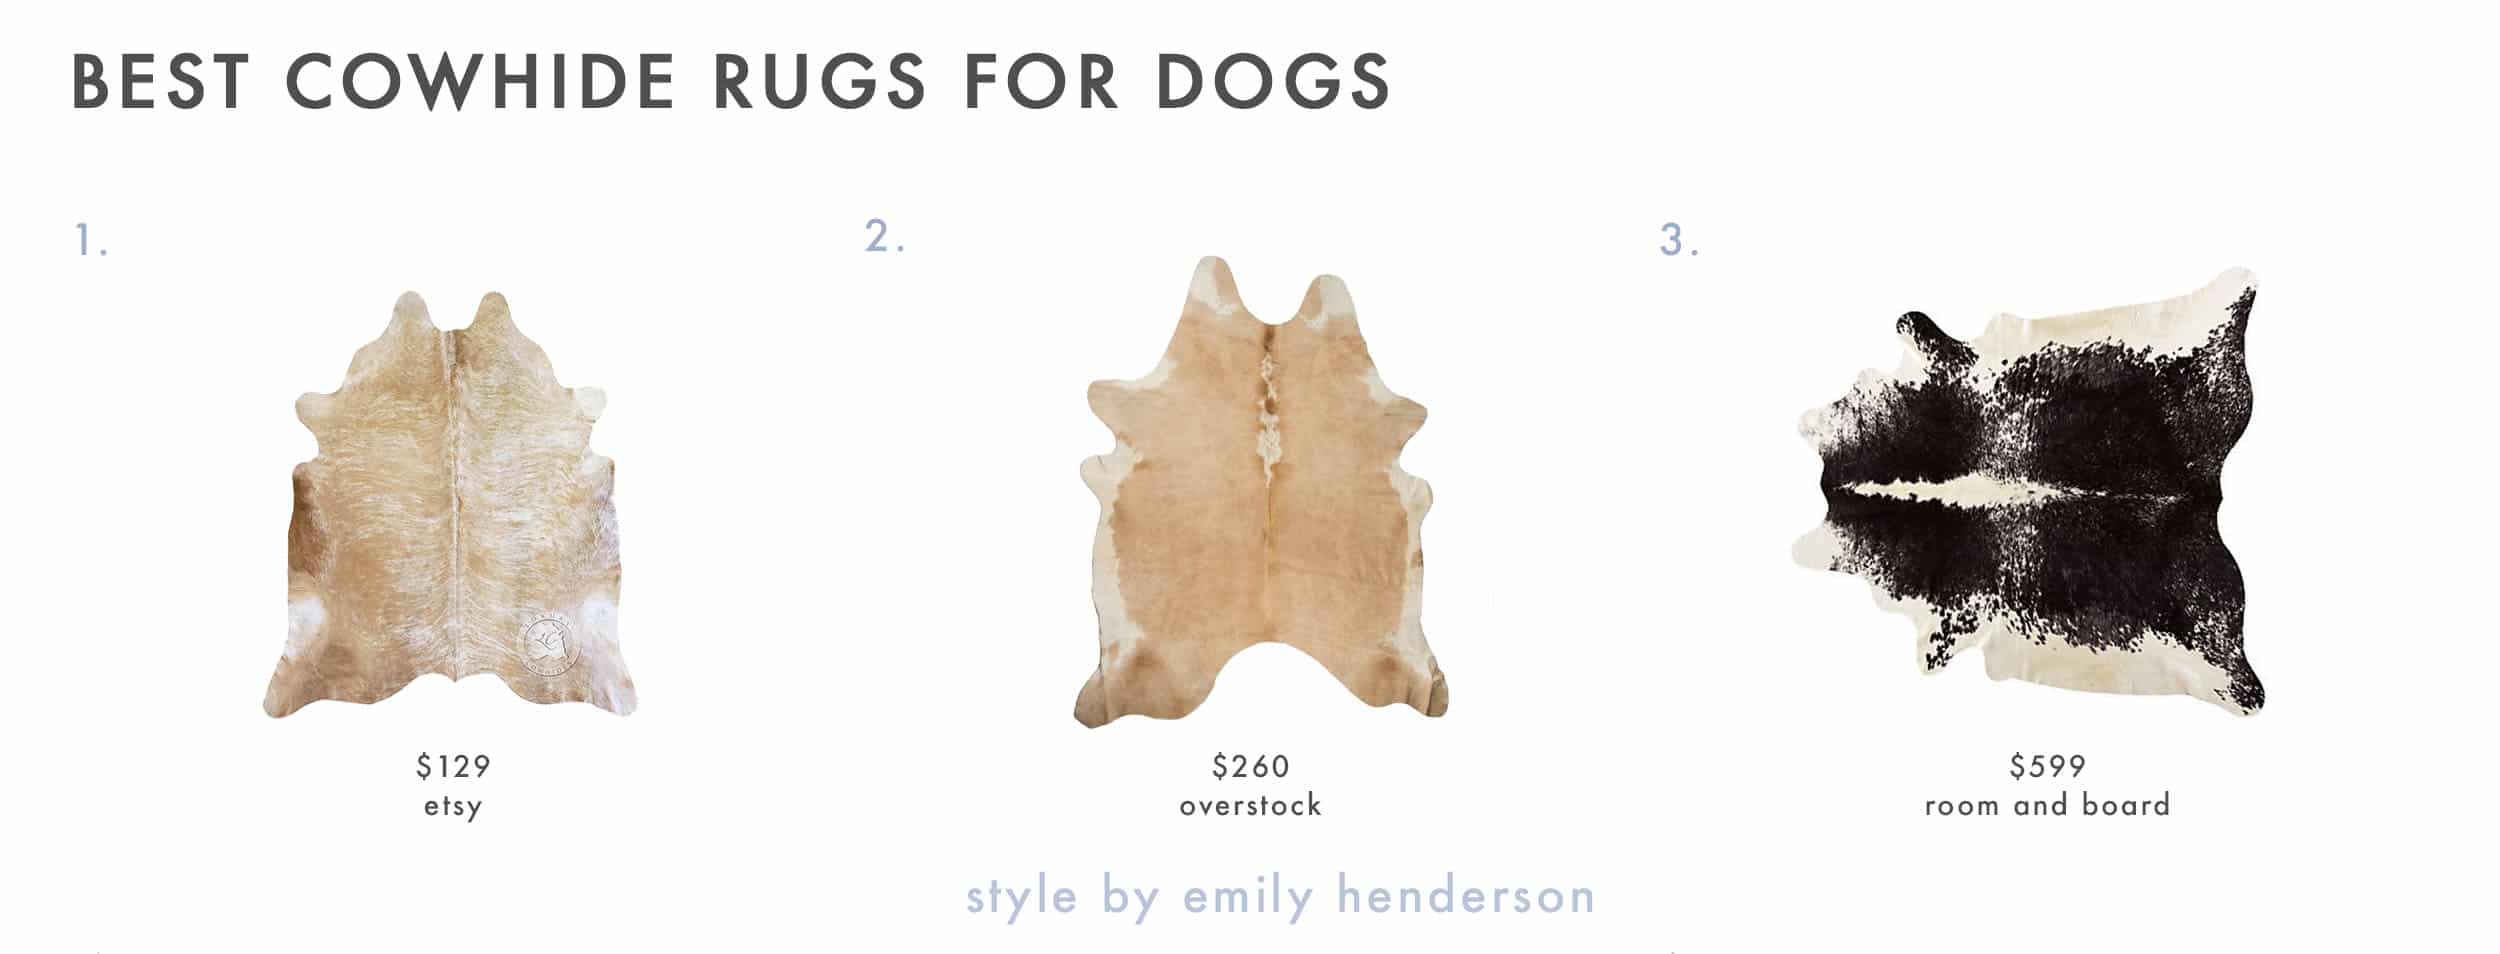 Dog Friendly Cowhide Rugs 1